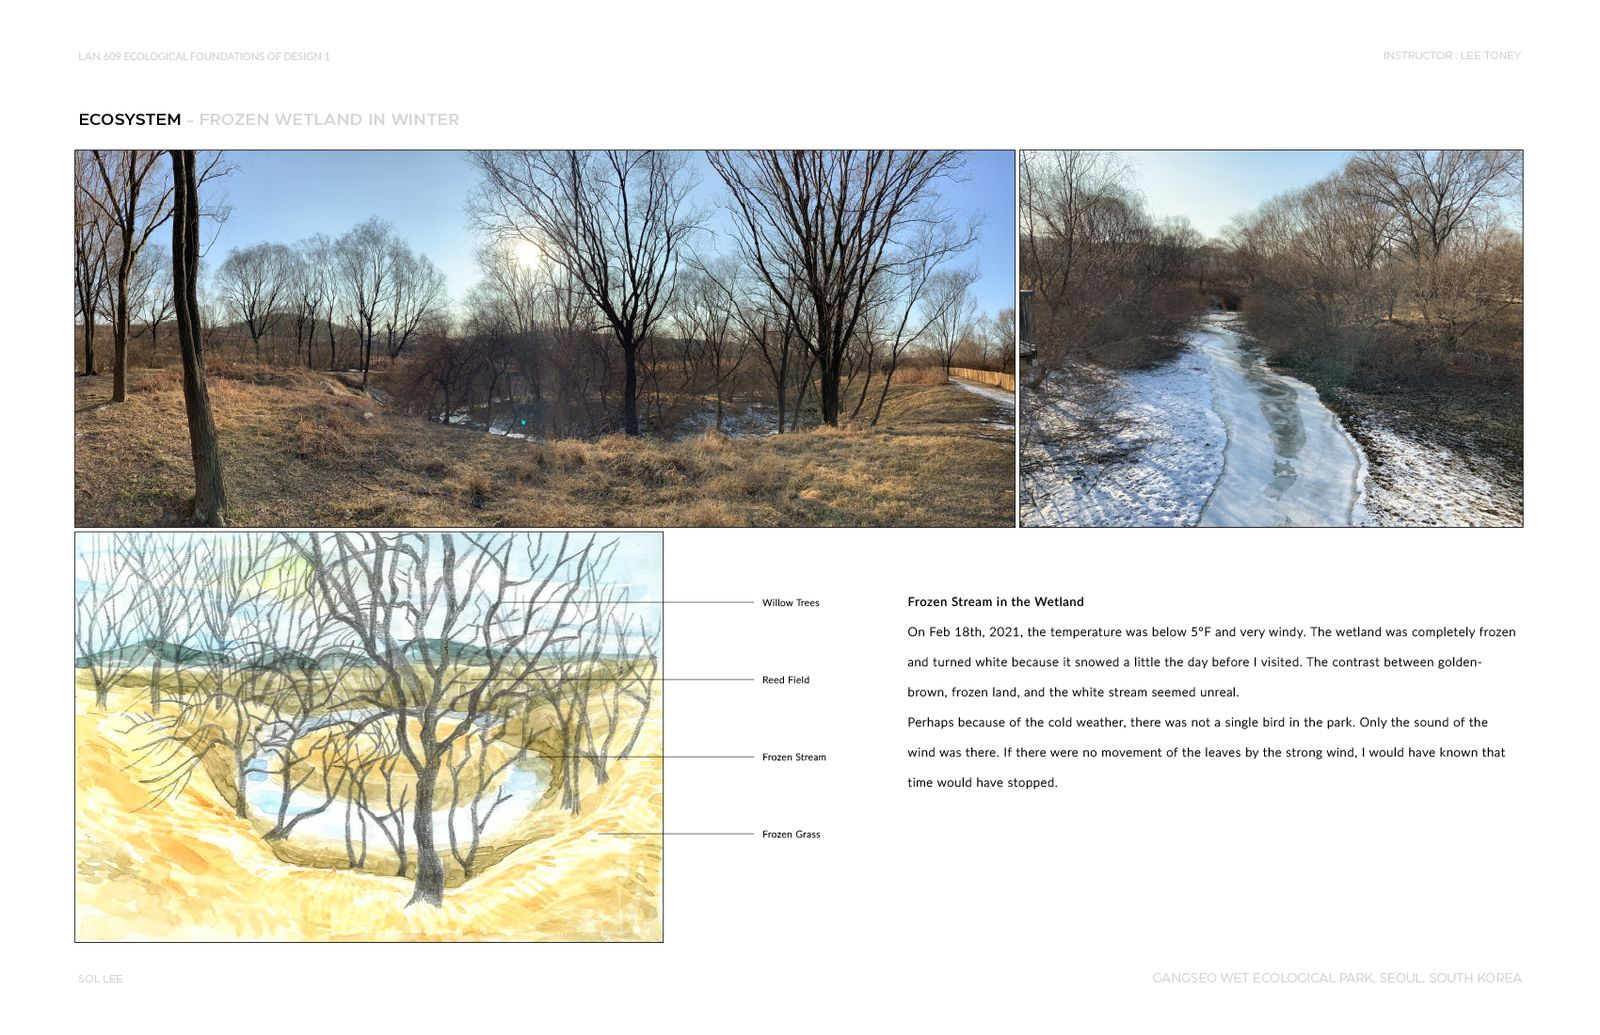 Gangseo Wet Ecology Park - Ecosystem - Frozen Wetland in Winter